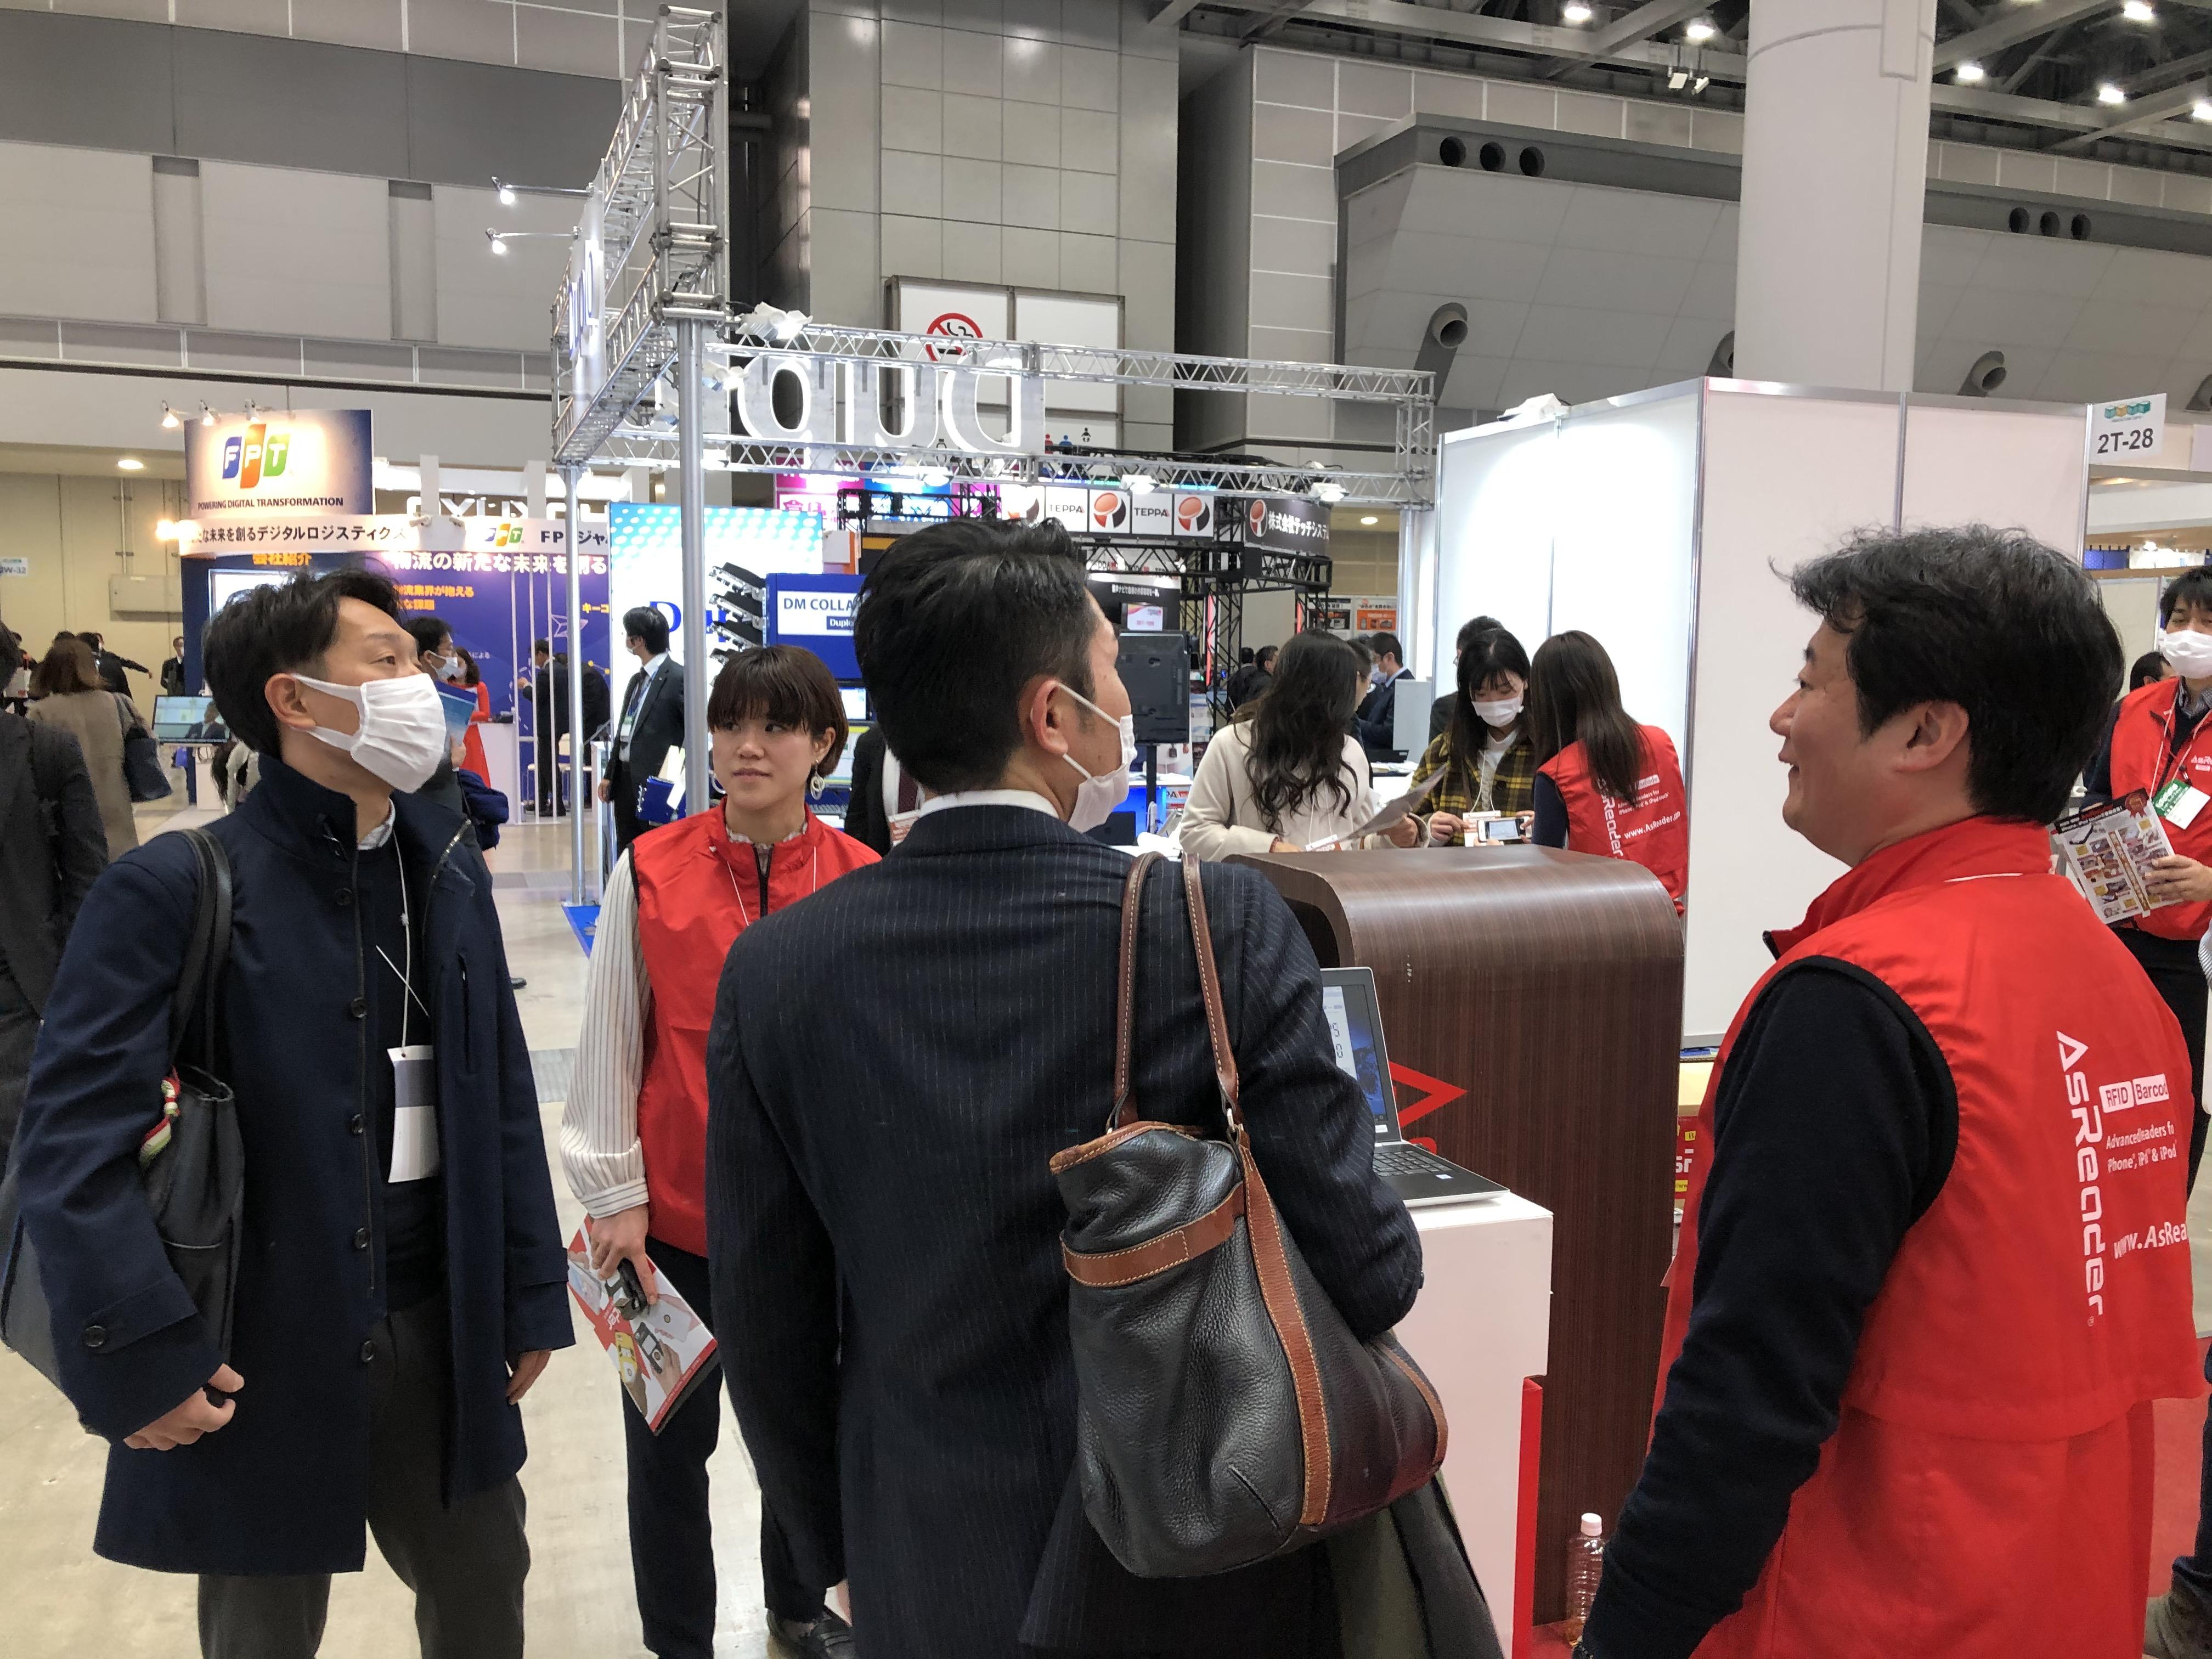 国際物流総合展2020 -INNOVATION EXPO-